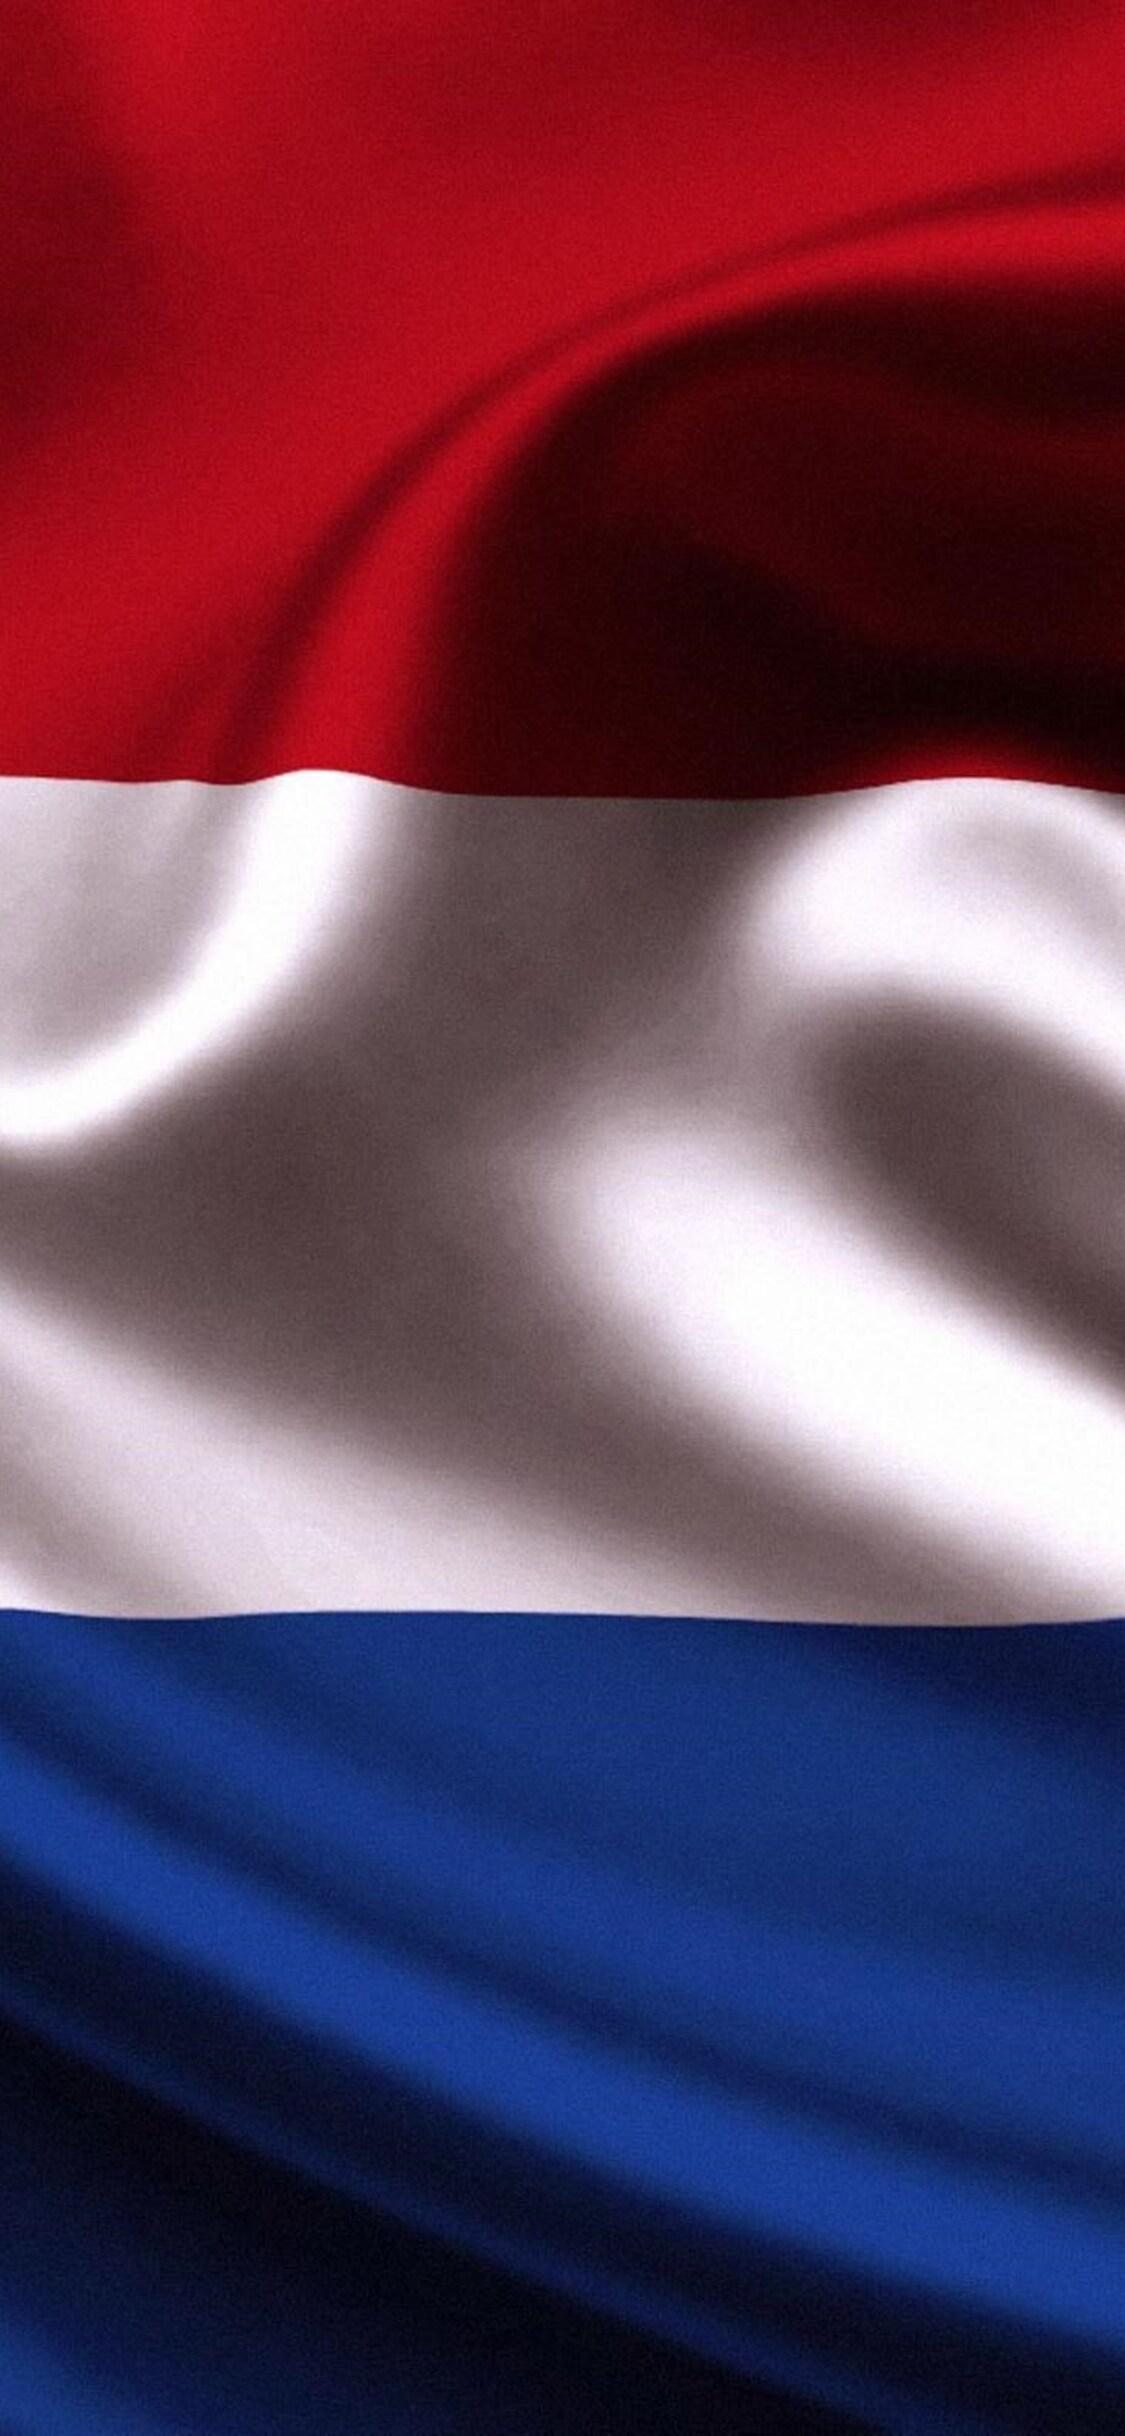 1125x2436 Netherlands Flag Iphone Xsiphone 10iphone X Hd 4k